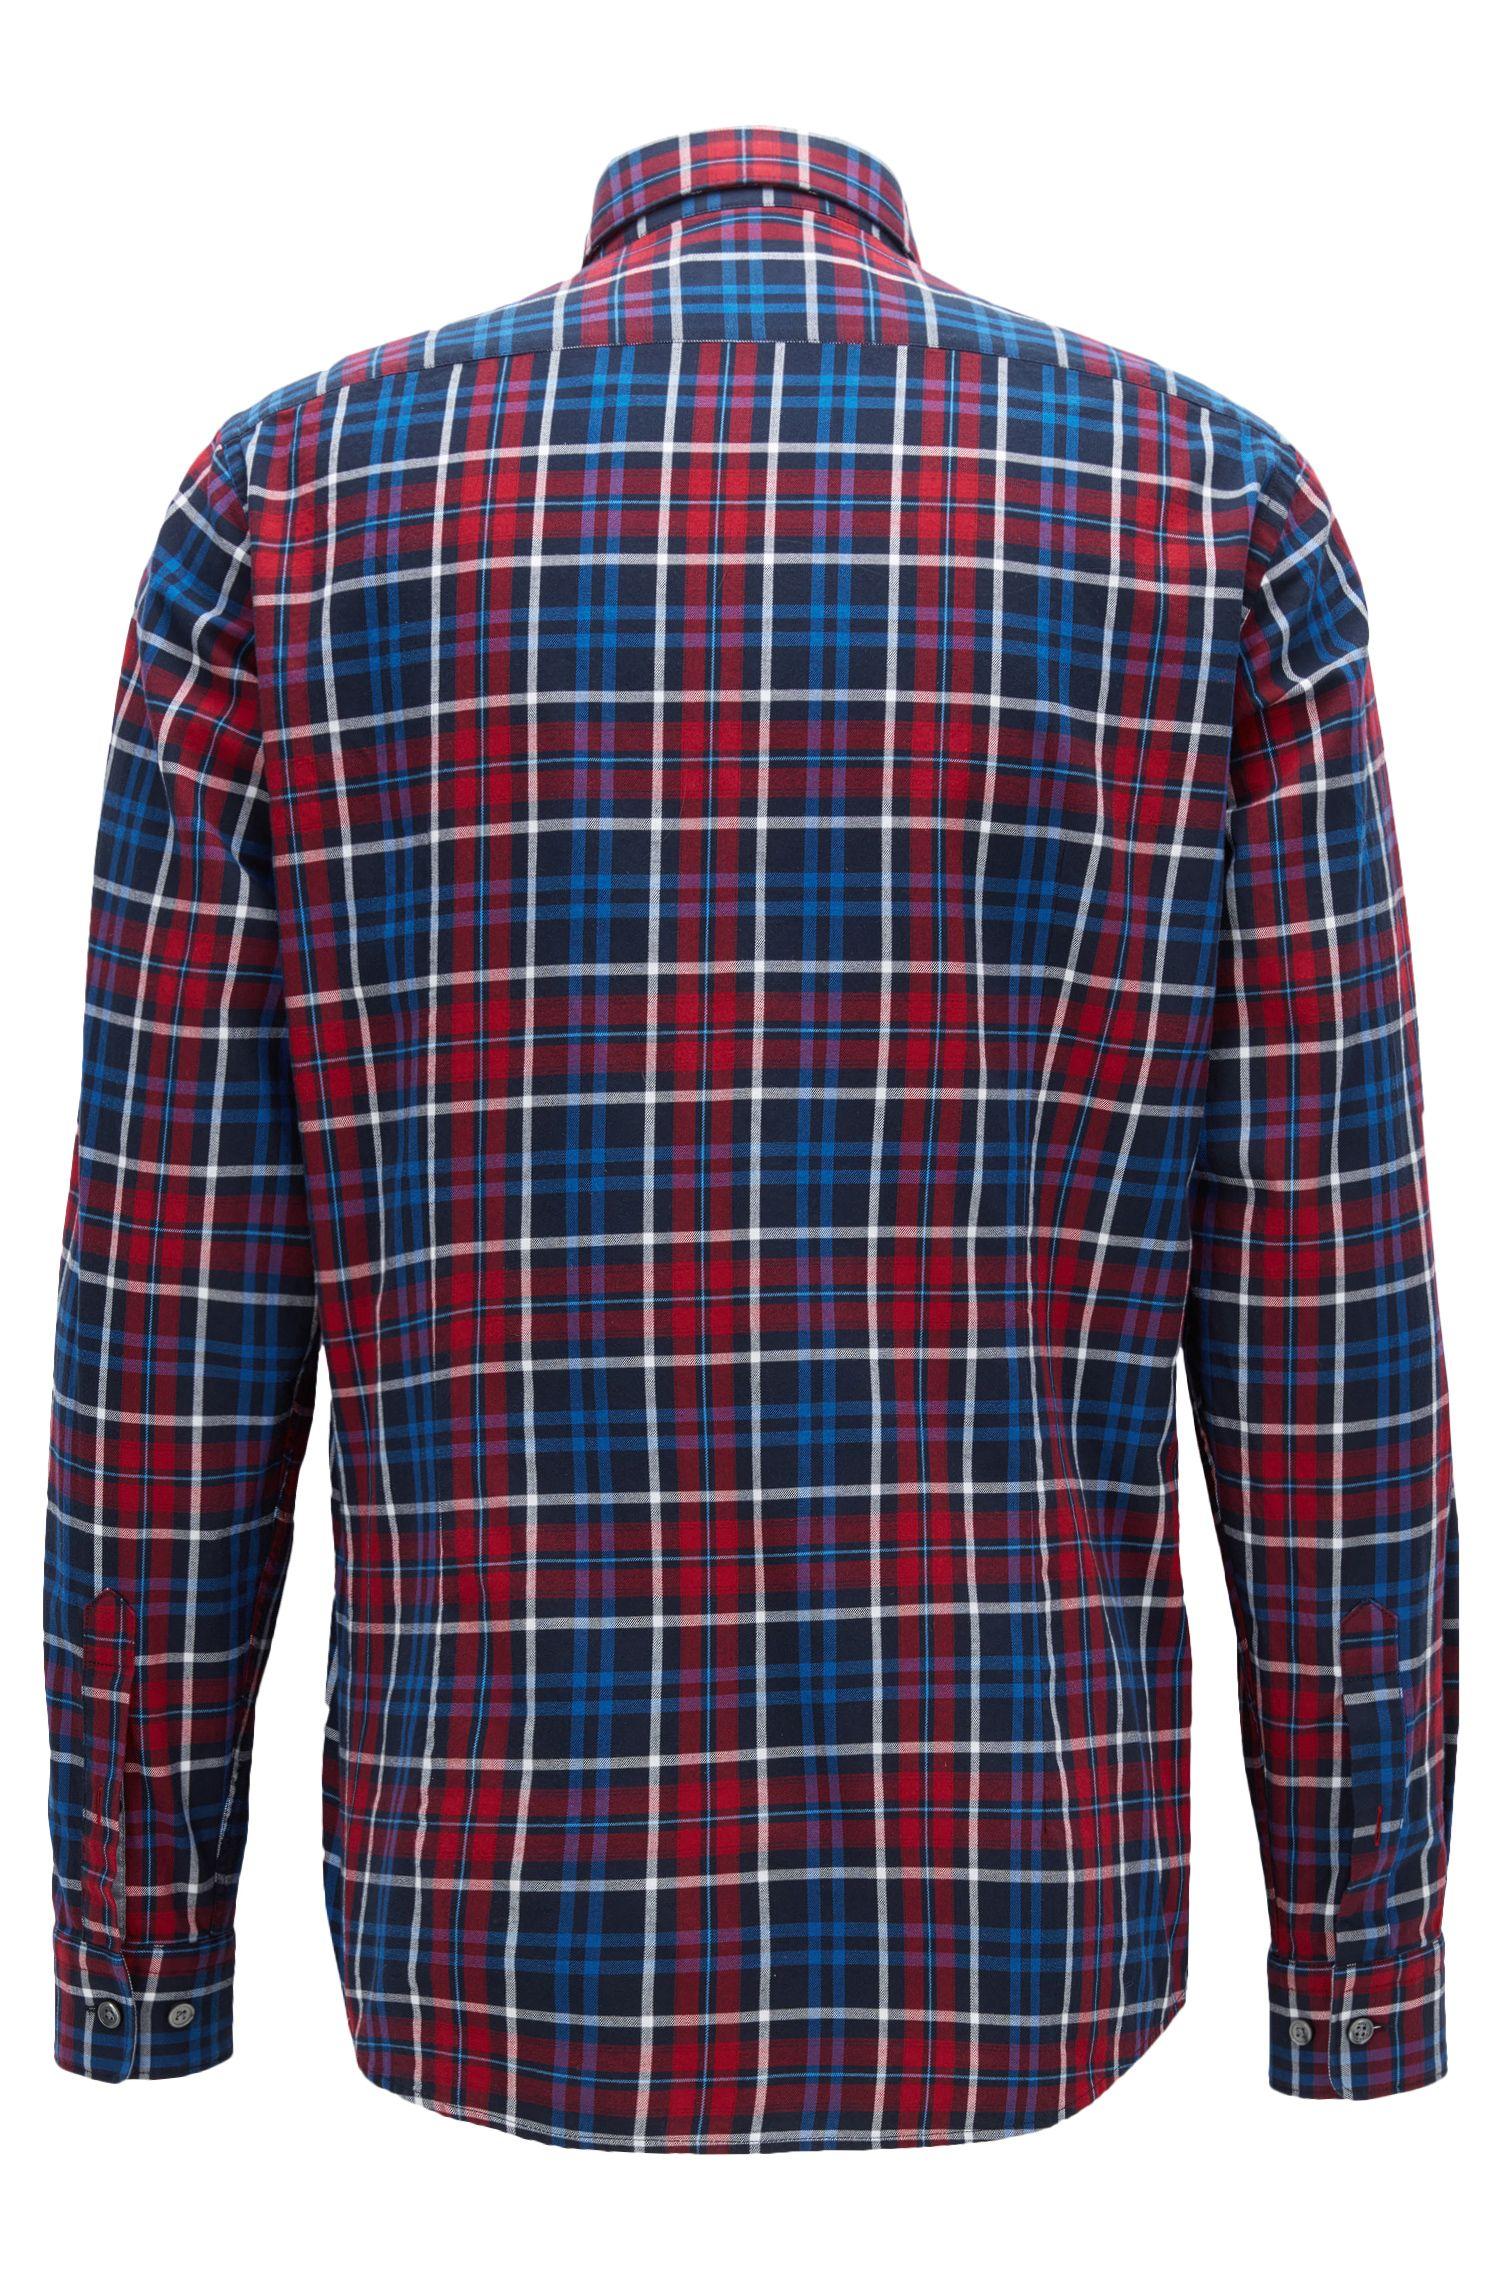 Plaid Cotton Button Down Shirt, Regular Fit   Lod